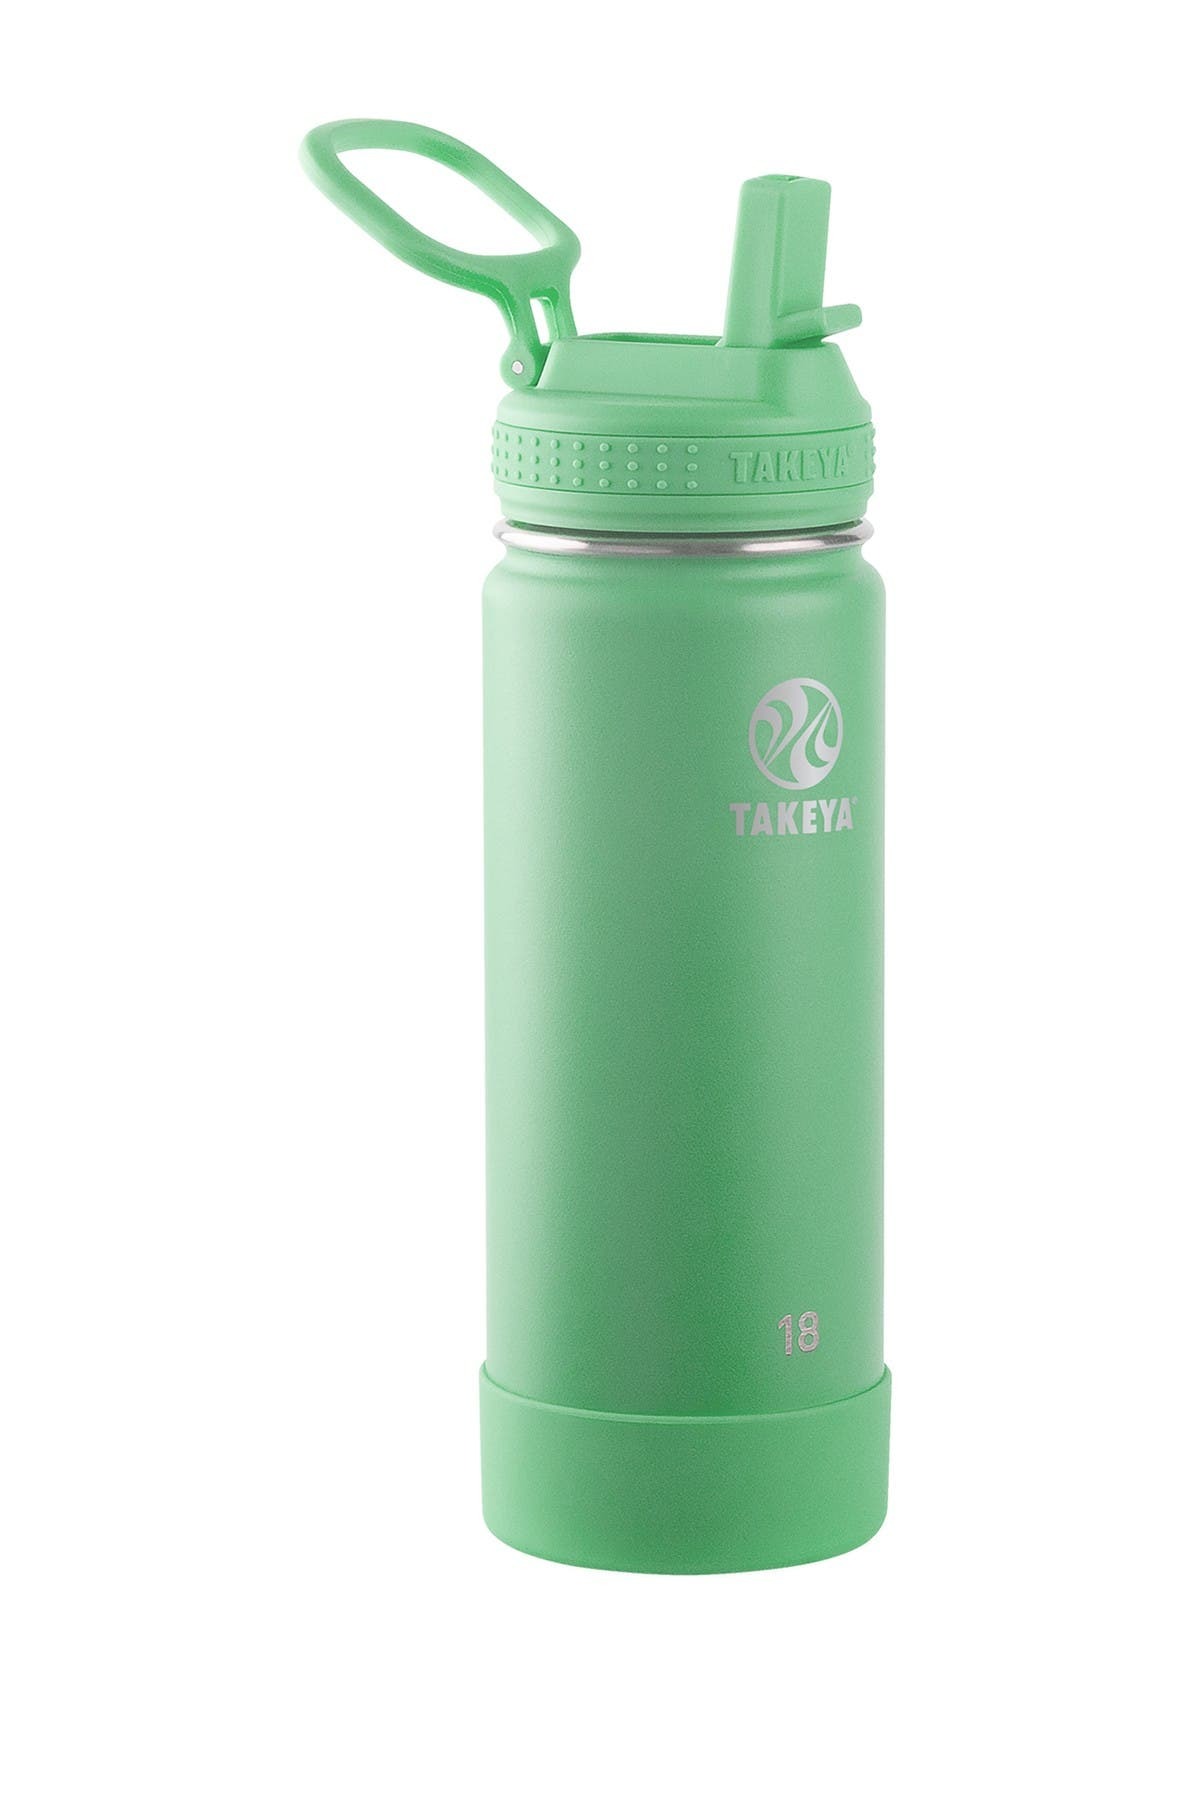 Image of Takeya Actives 18 oz. Straw Bottle - Mint